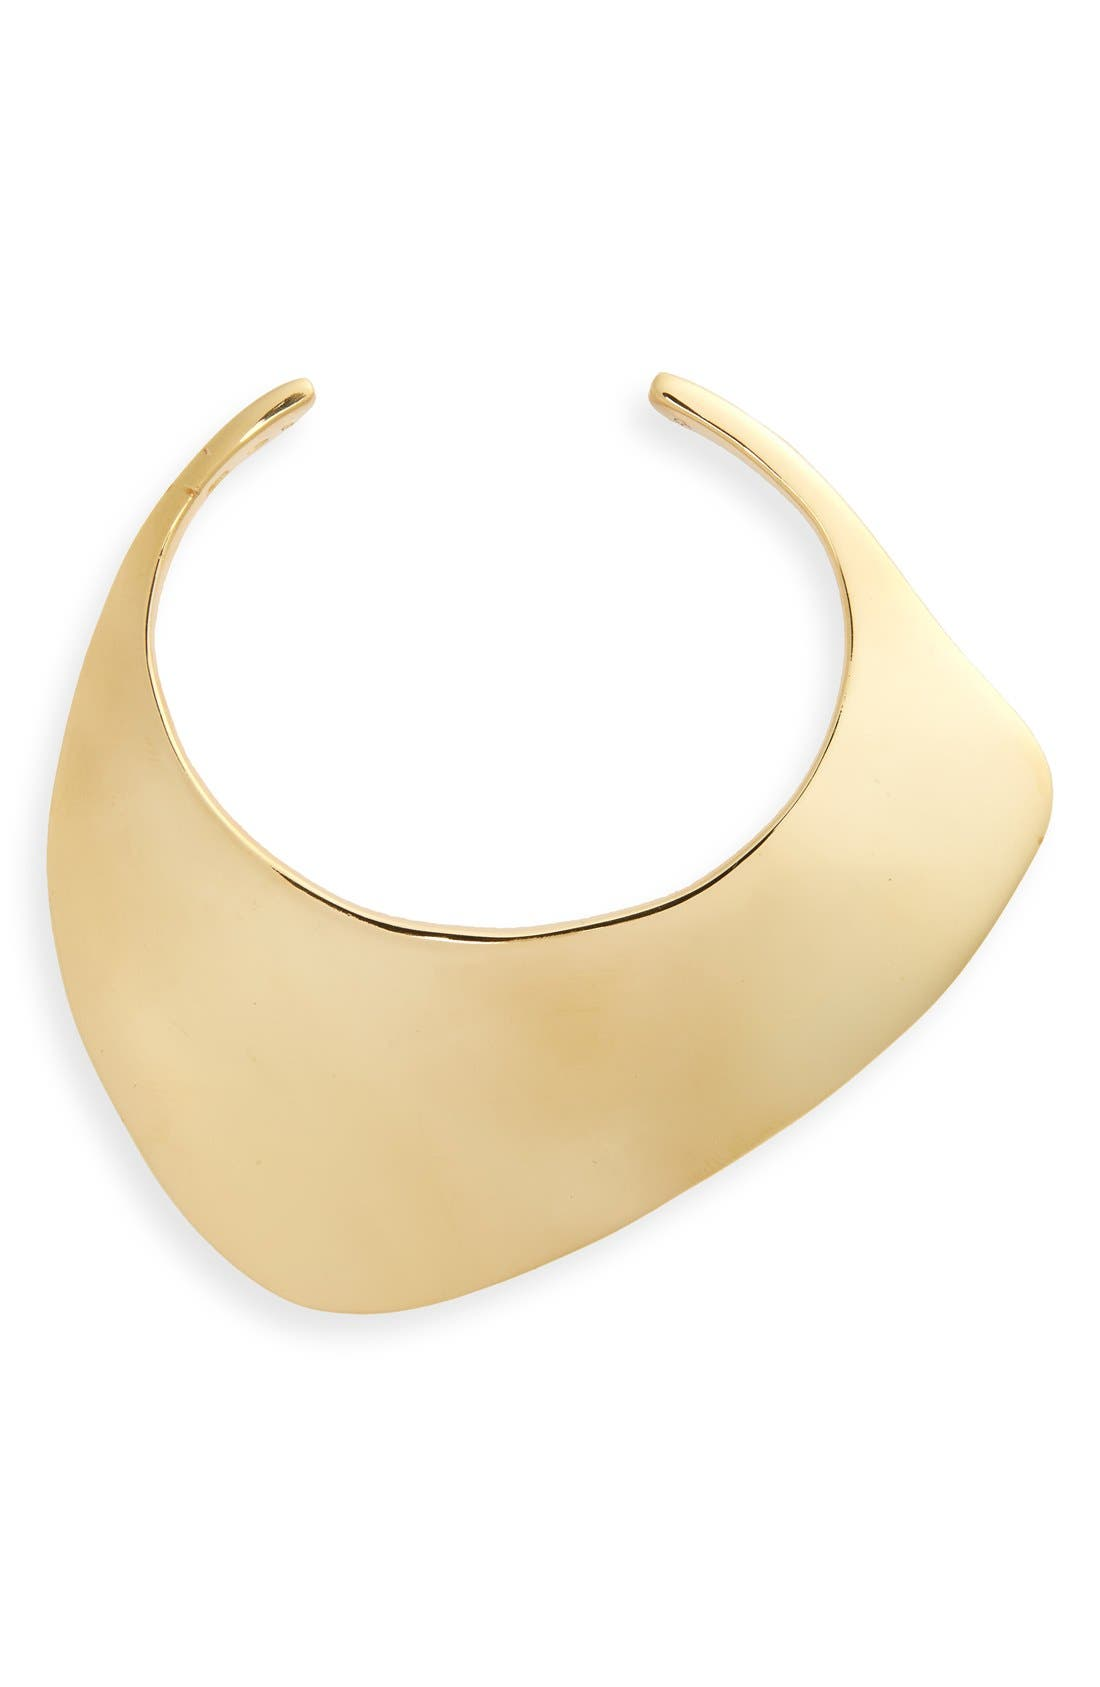 Alternate Image 1 Selected - Charlotte Chesnais Large Ada Cuff Bracelet